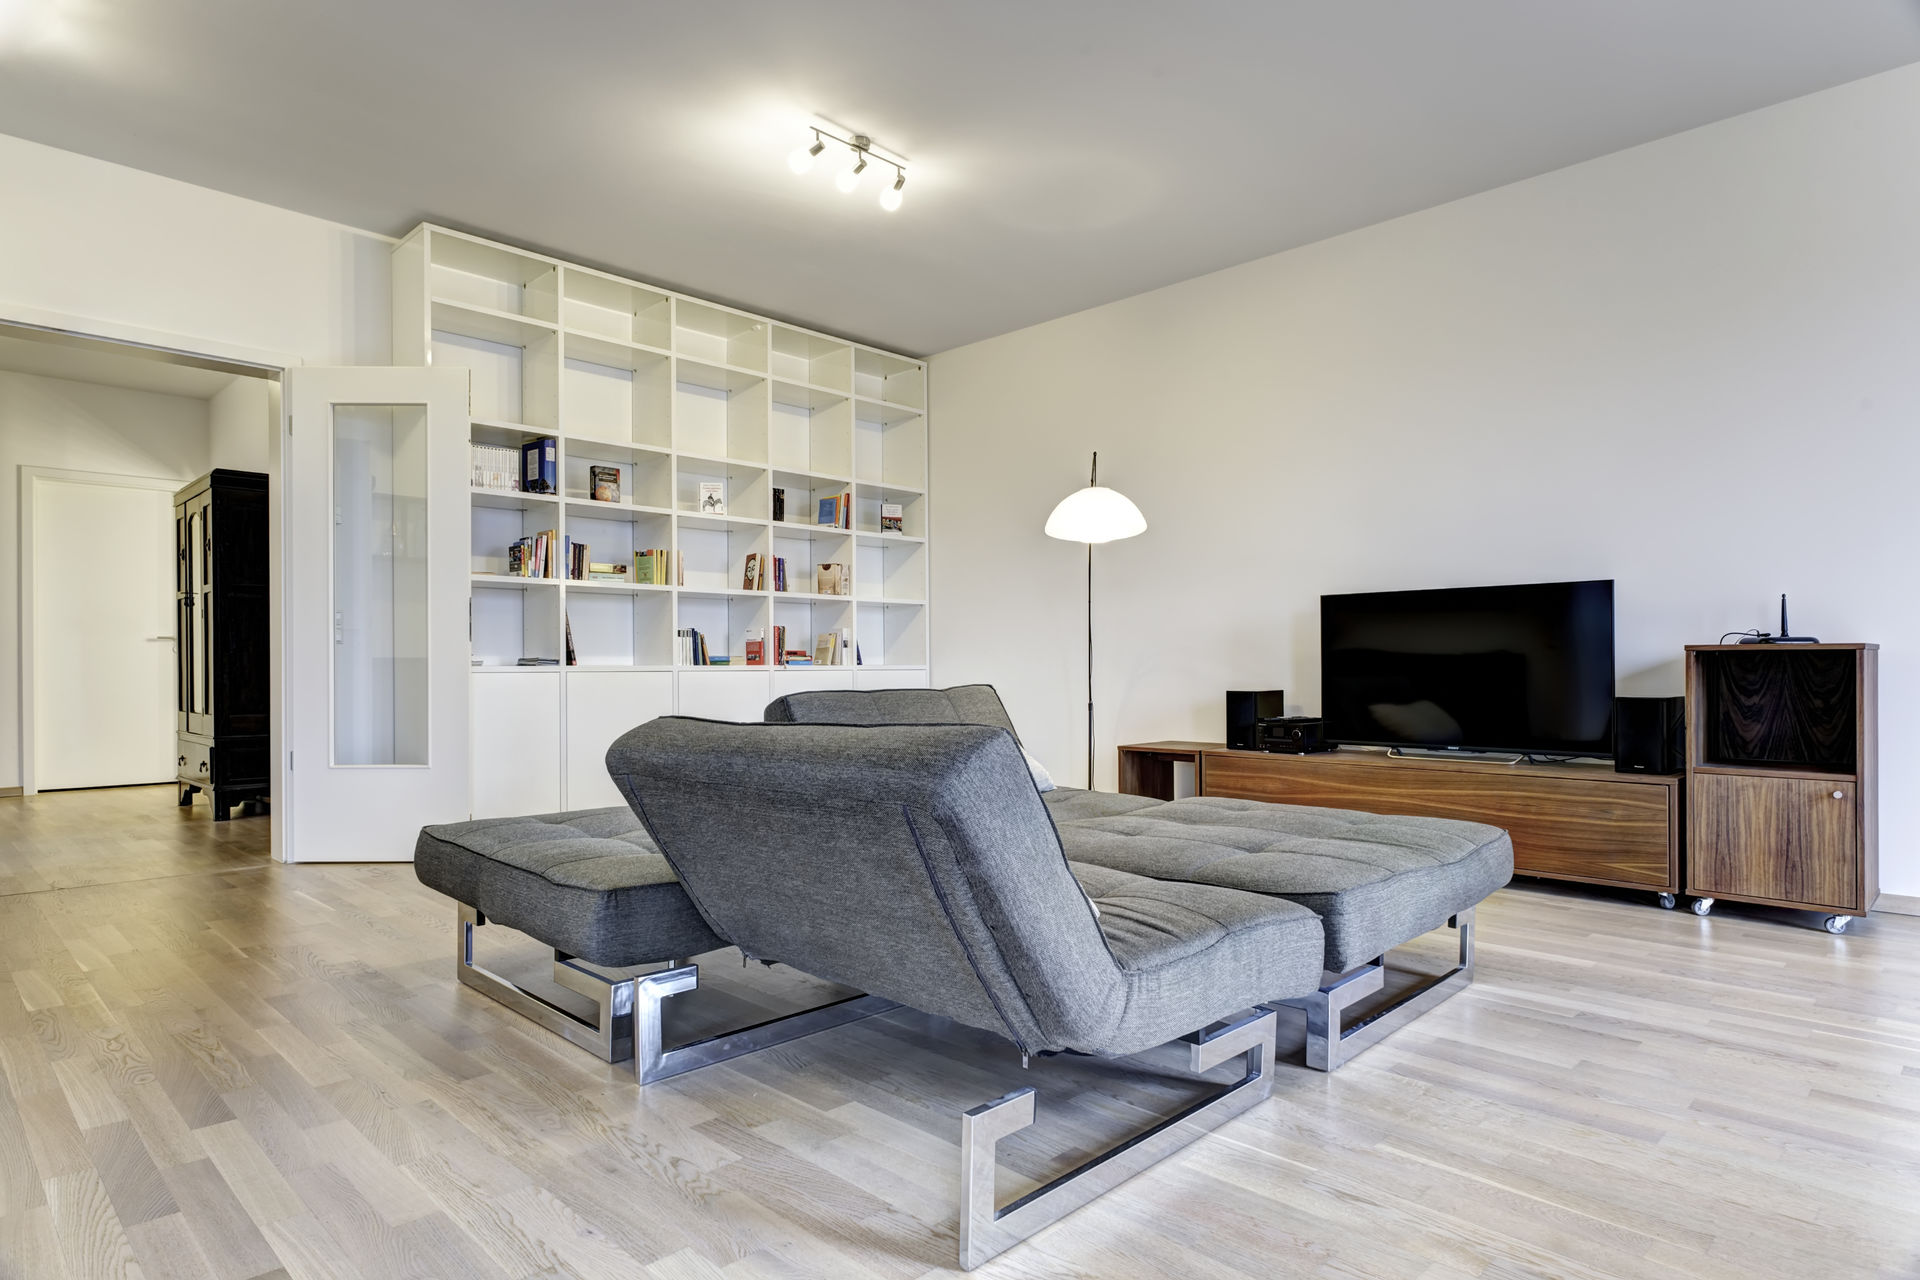 Luxurises Apartment mit Terrasse im Stadtteil Kreuzberg